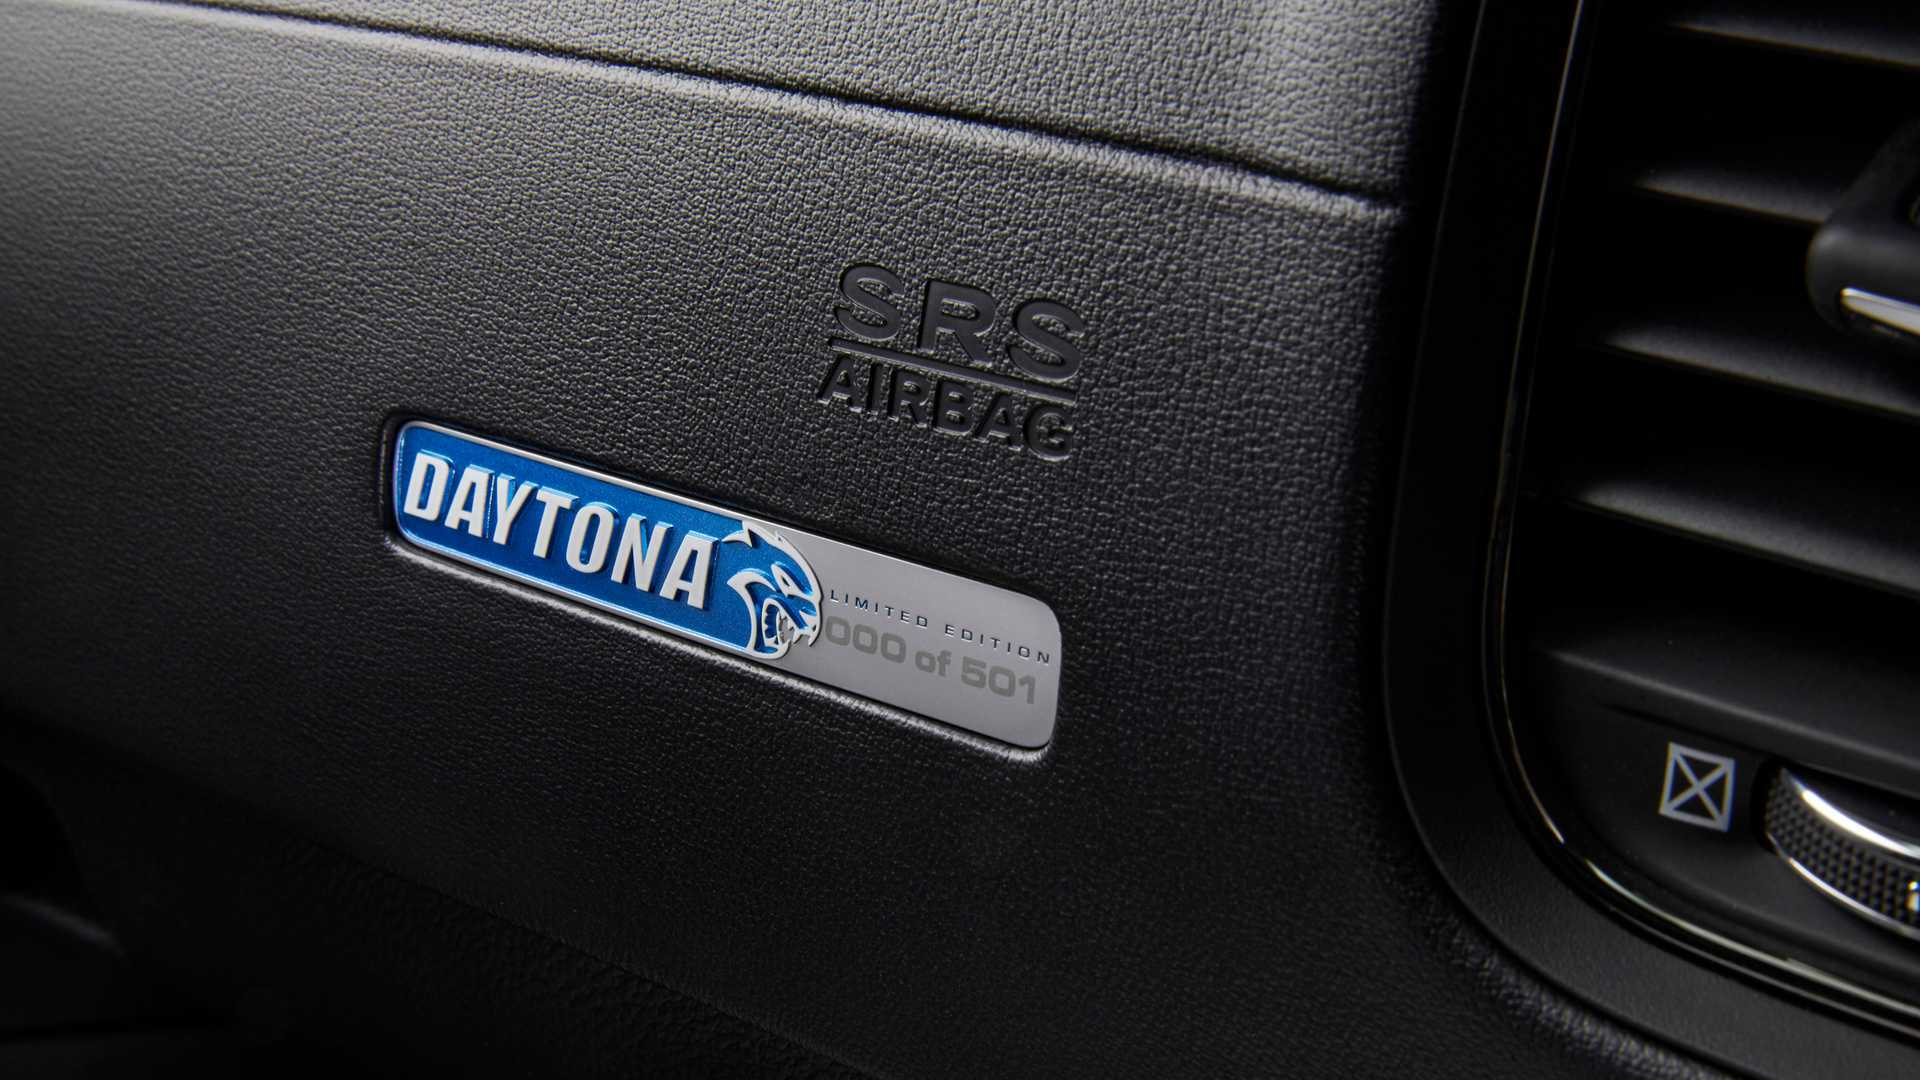 Dodge Charger Daytona 50th Anniversary Edition